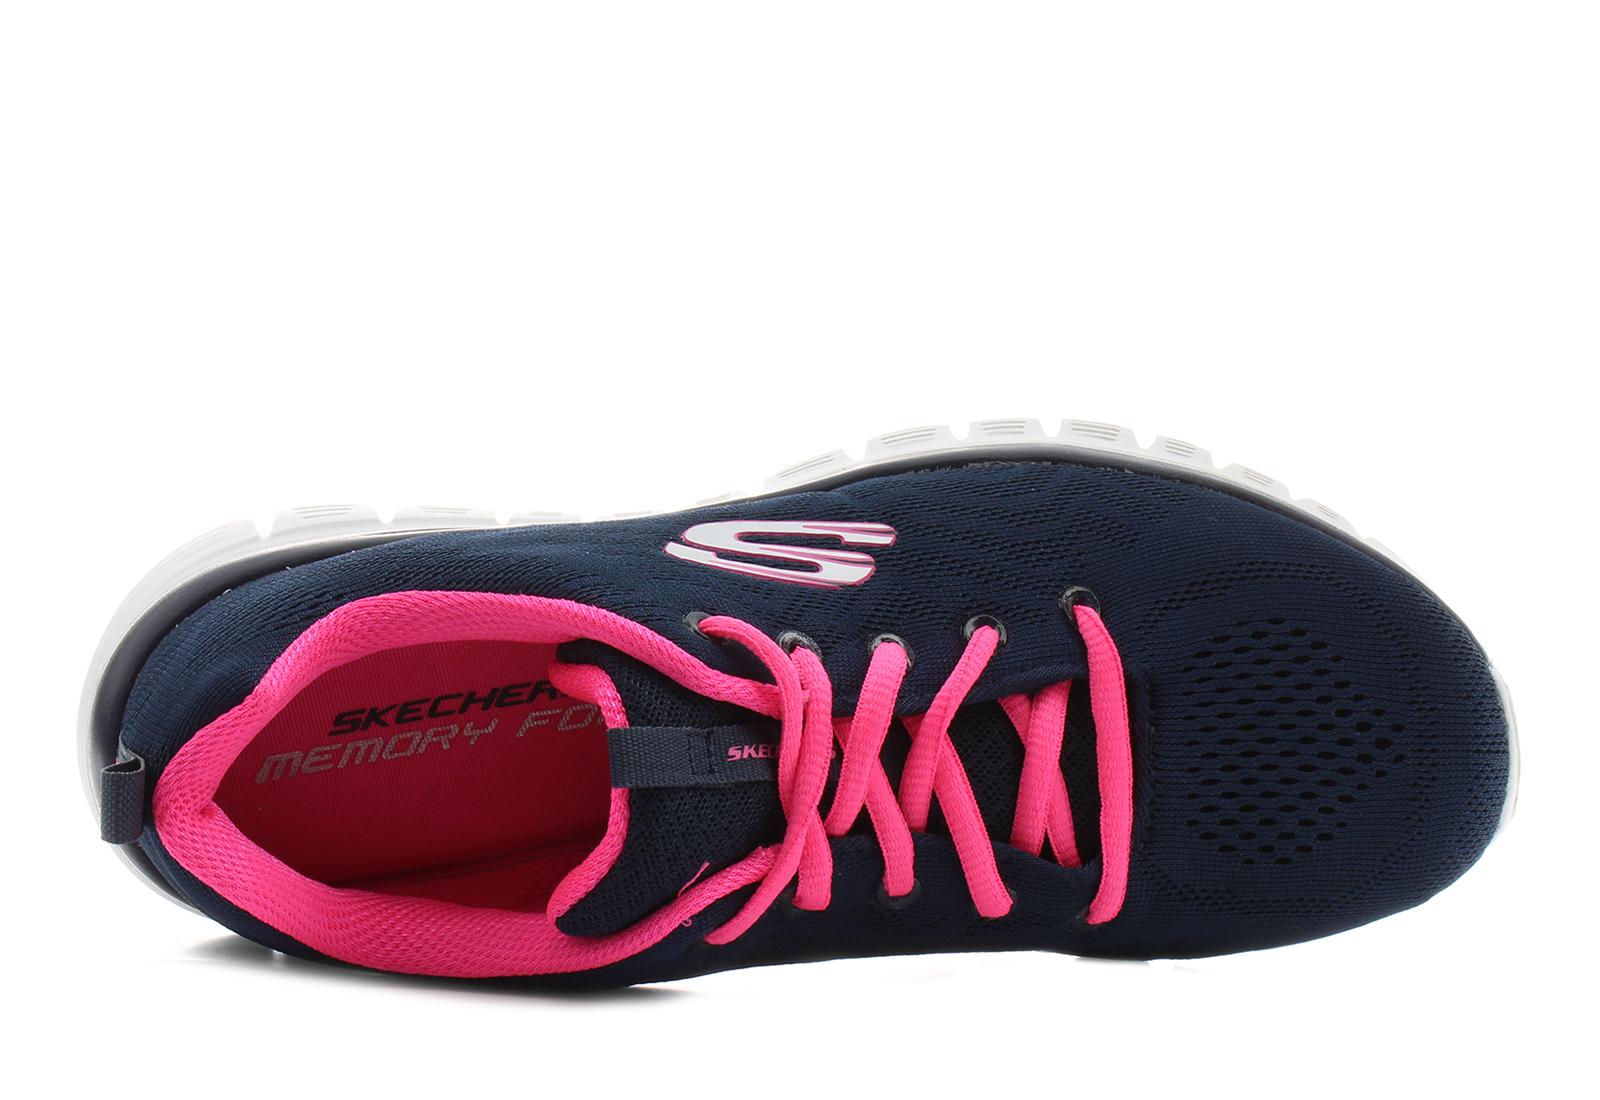 movimiento Permeabilidad grua  Skechers Cipő - Graceful - Get Connected - 12615-nvhp - Office Shoes  Magyarország